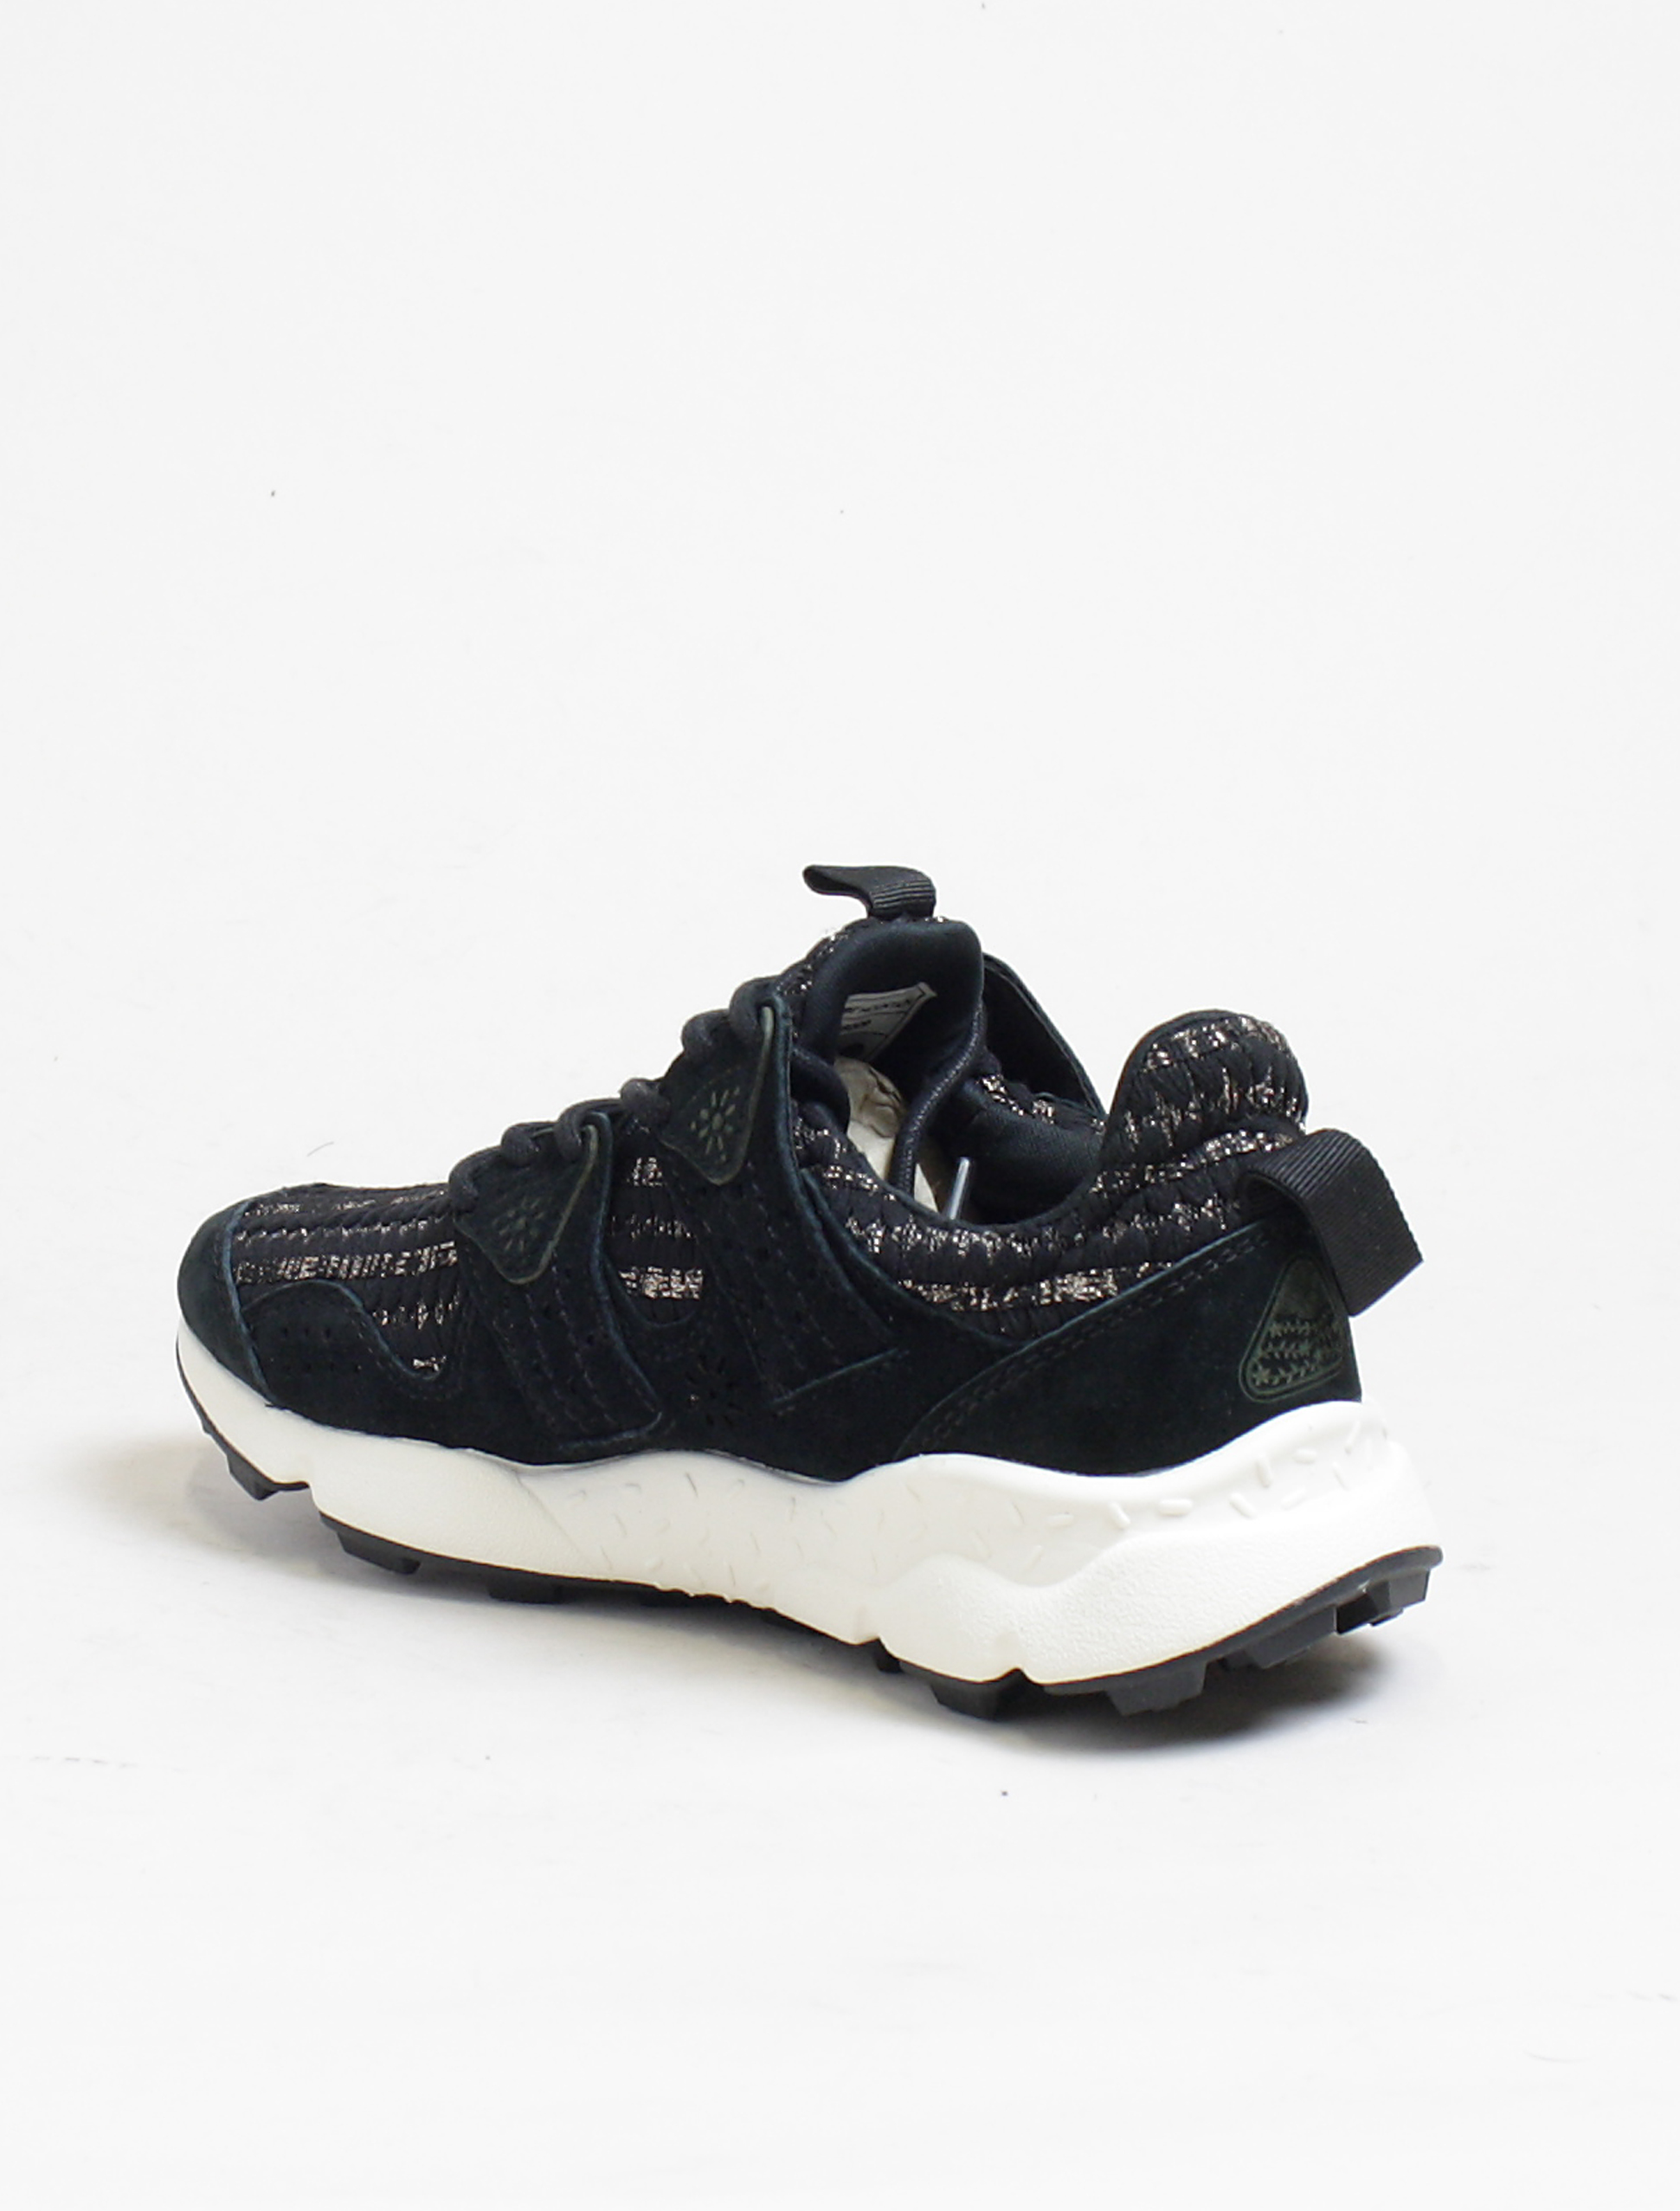 Flower Mountain sneakers Corax lurex stripes black gold dettaglio interno